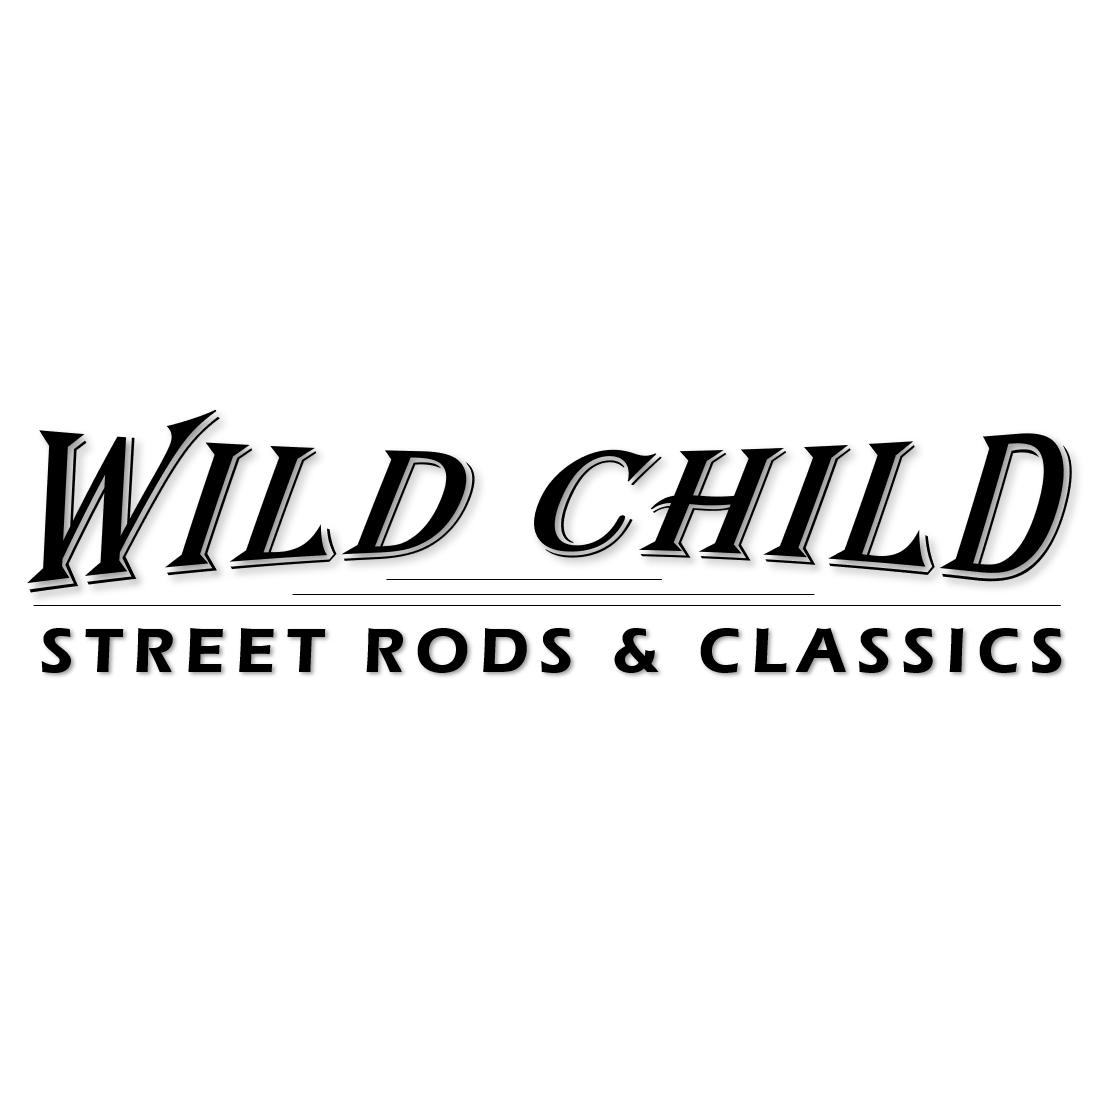 Wild Child Street Rods and Classics